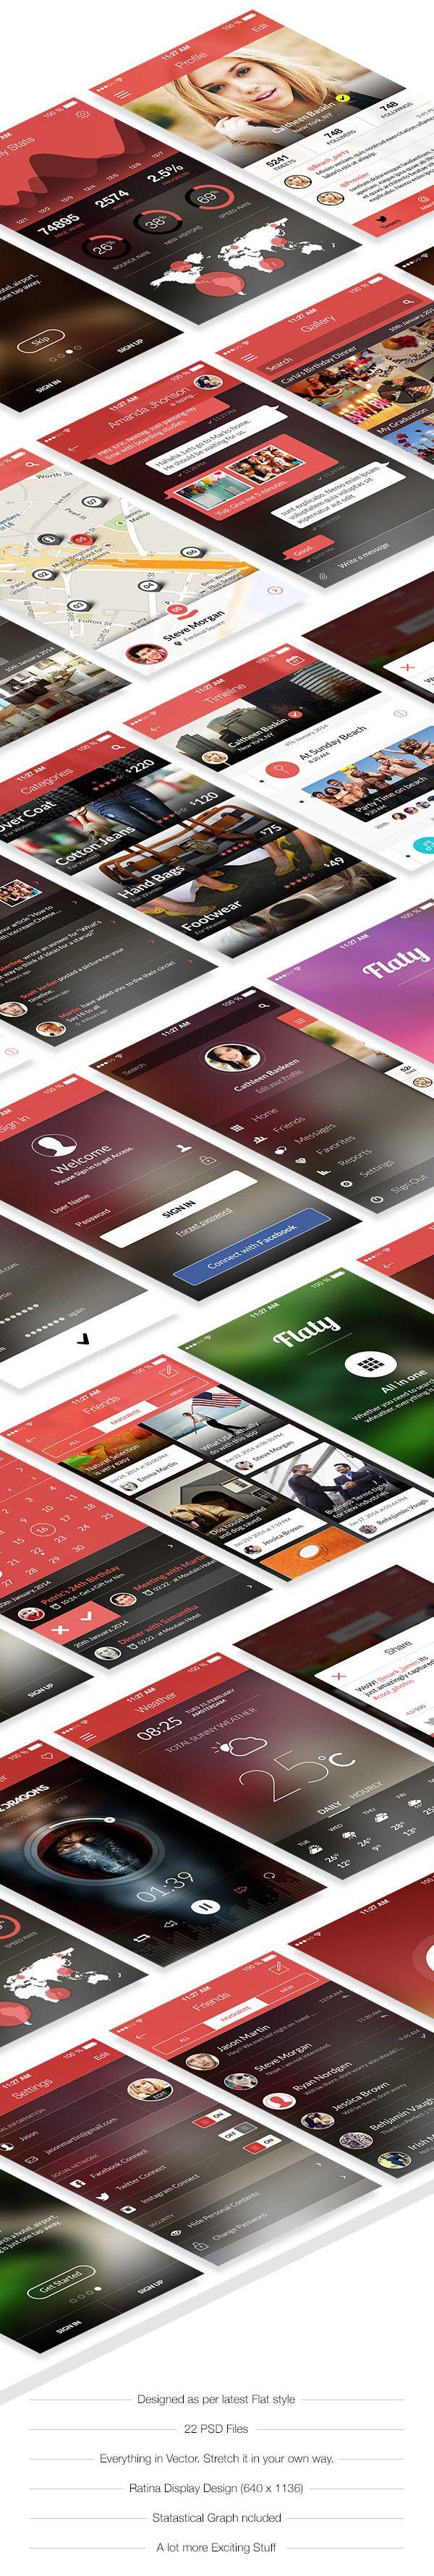 Flaty - A Beautiful Mobile Ui by Bouncy Studio, via Behance